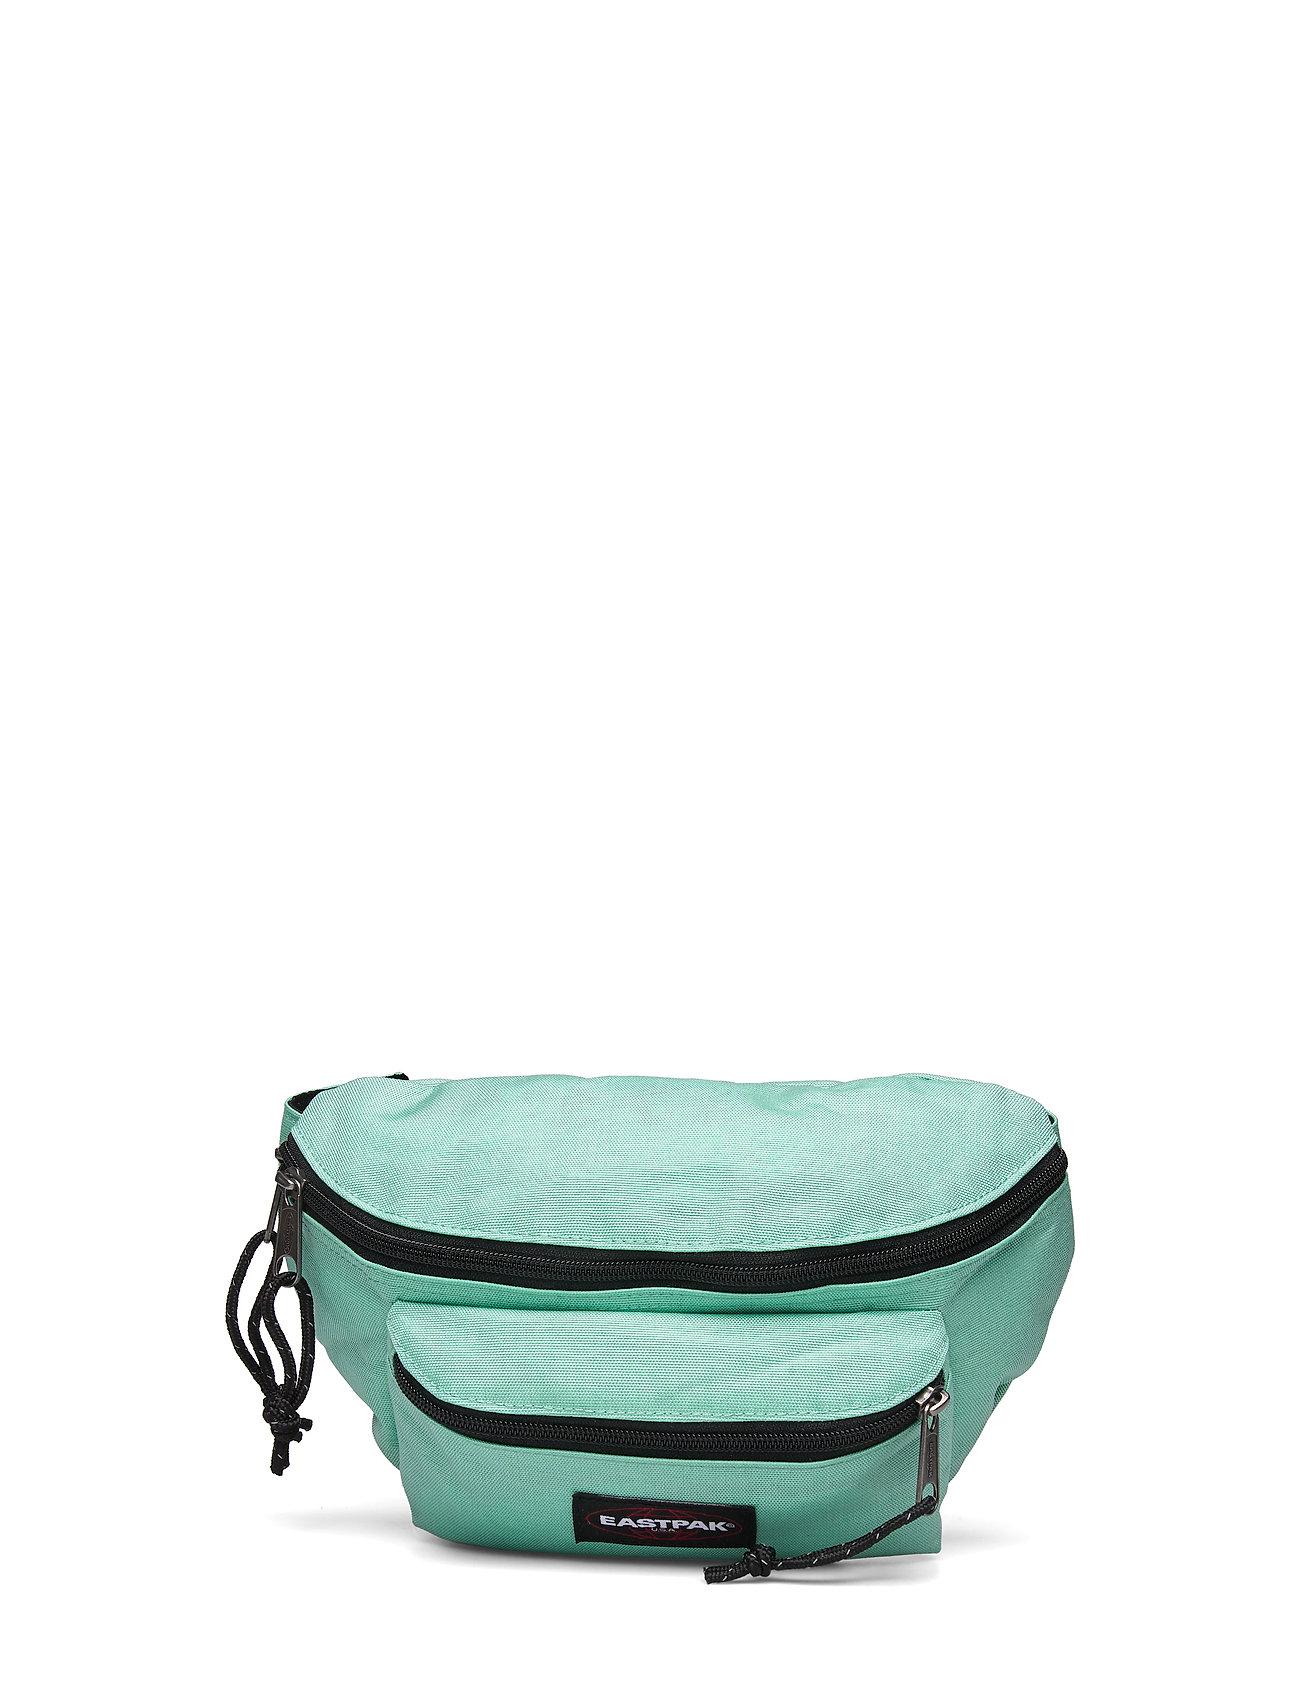 Eastpak Doggy Bag - MELLOW MINT